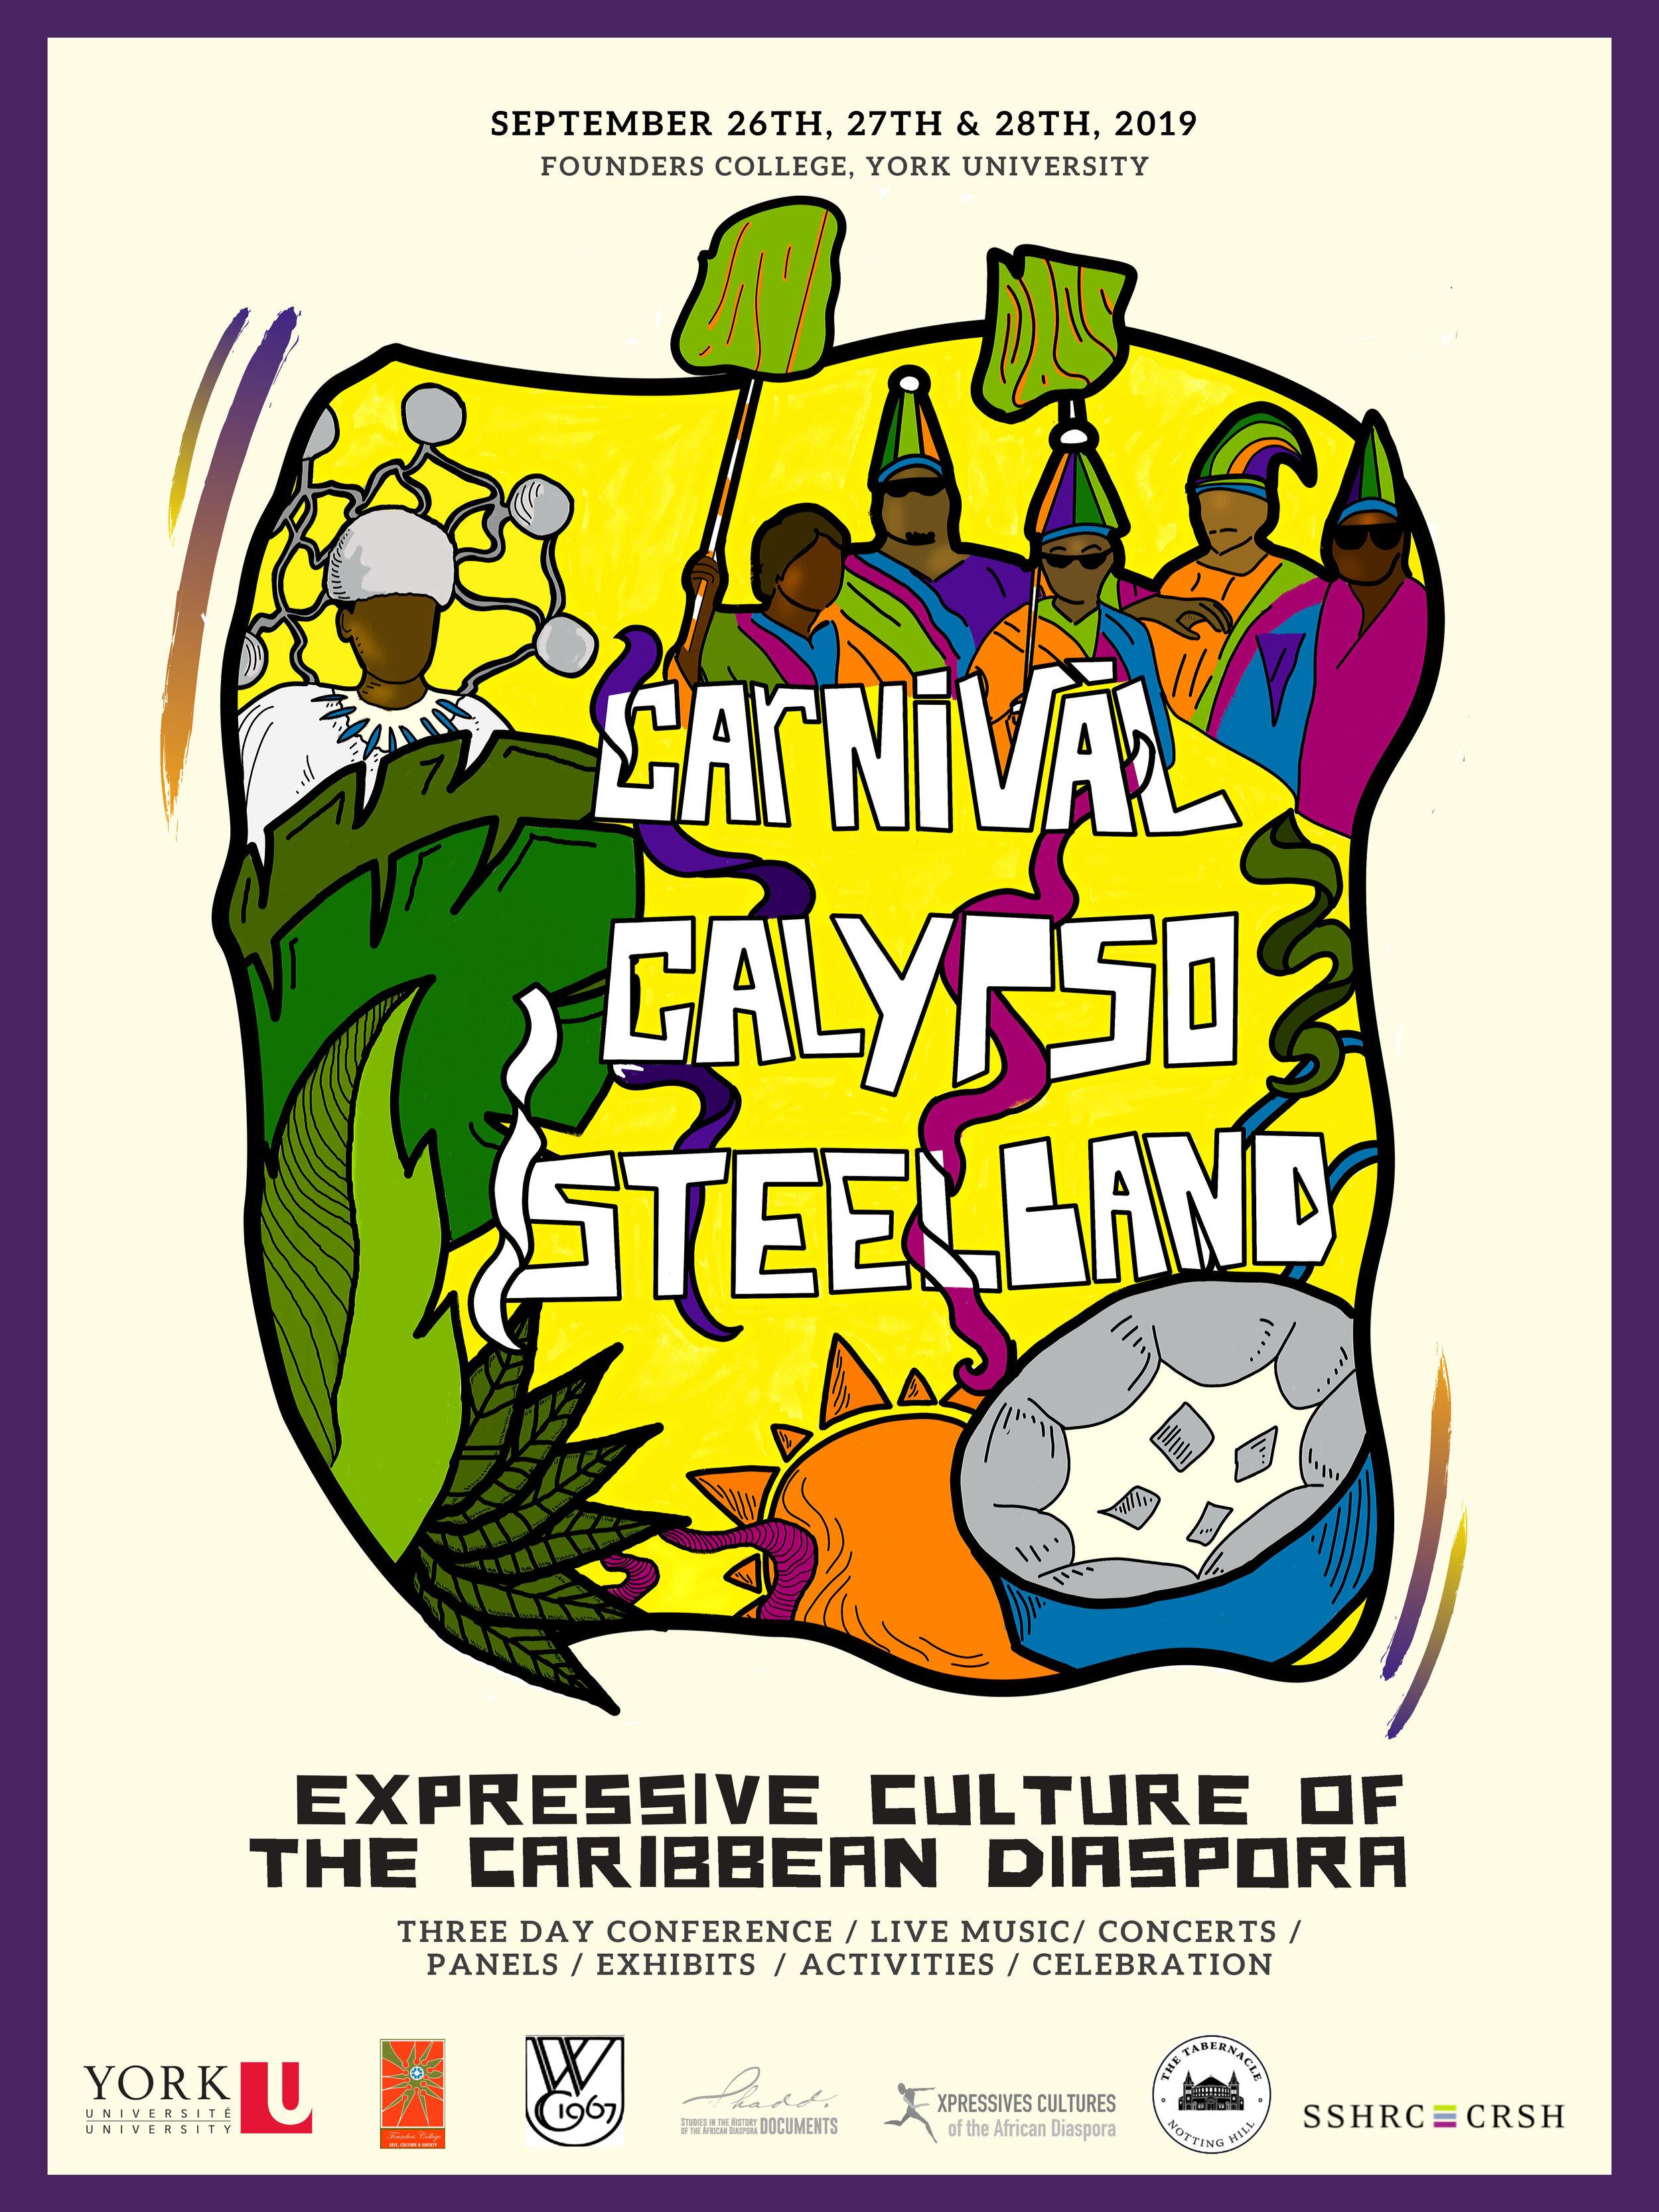 carnival calpyso steelband.jpg